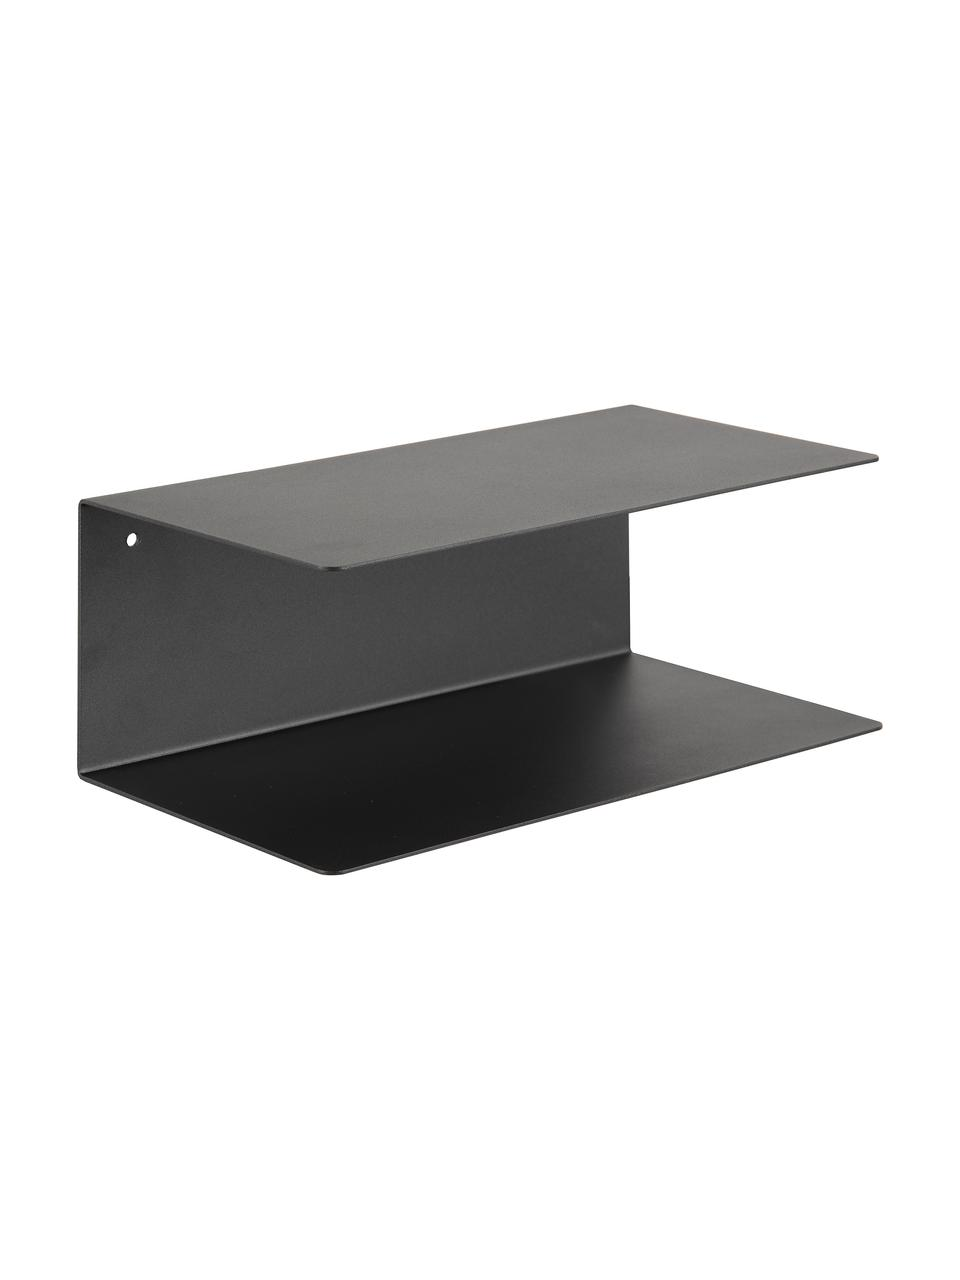 Schwarze Metall-Wandregale Newton, 2 Stück, Metall, pulverbeschichtet, Schwarz, 35 x 14 cm